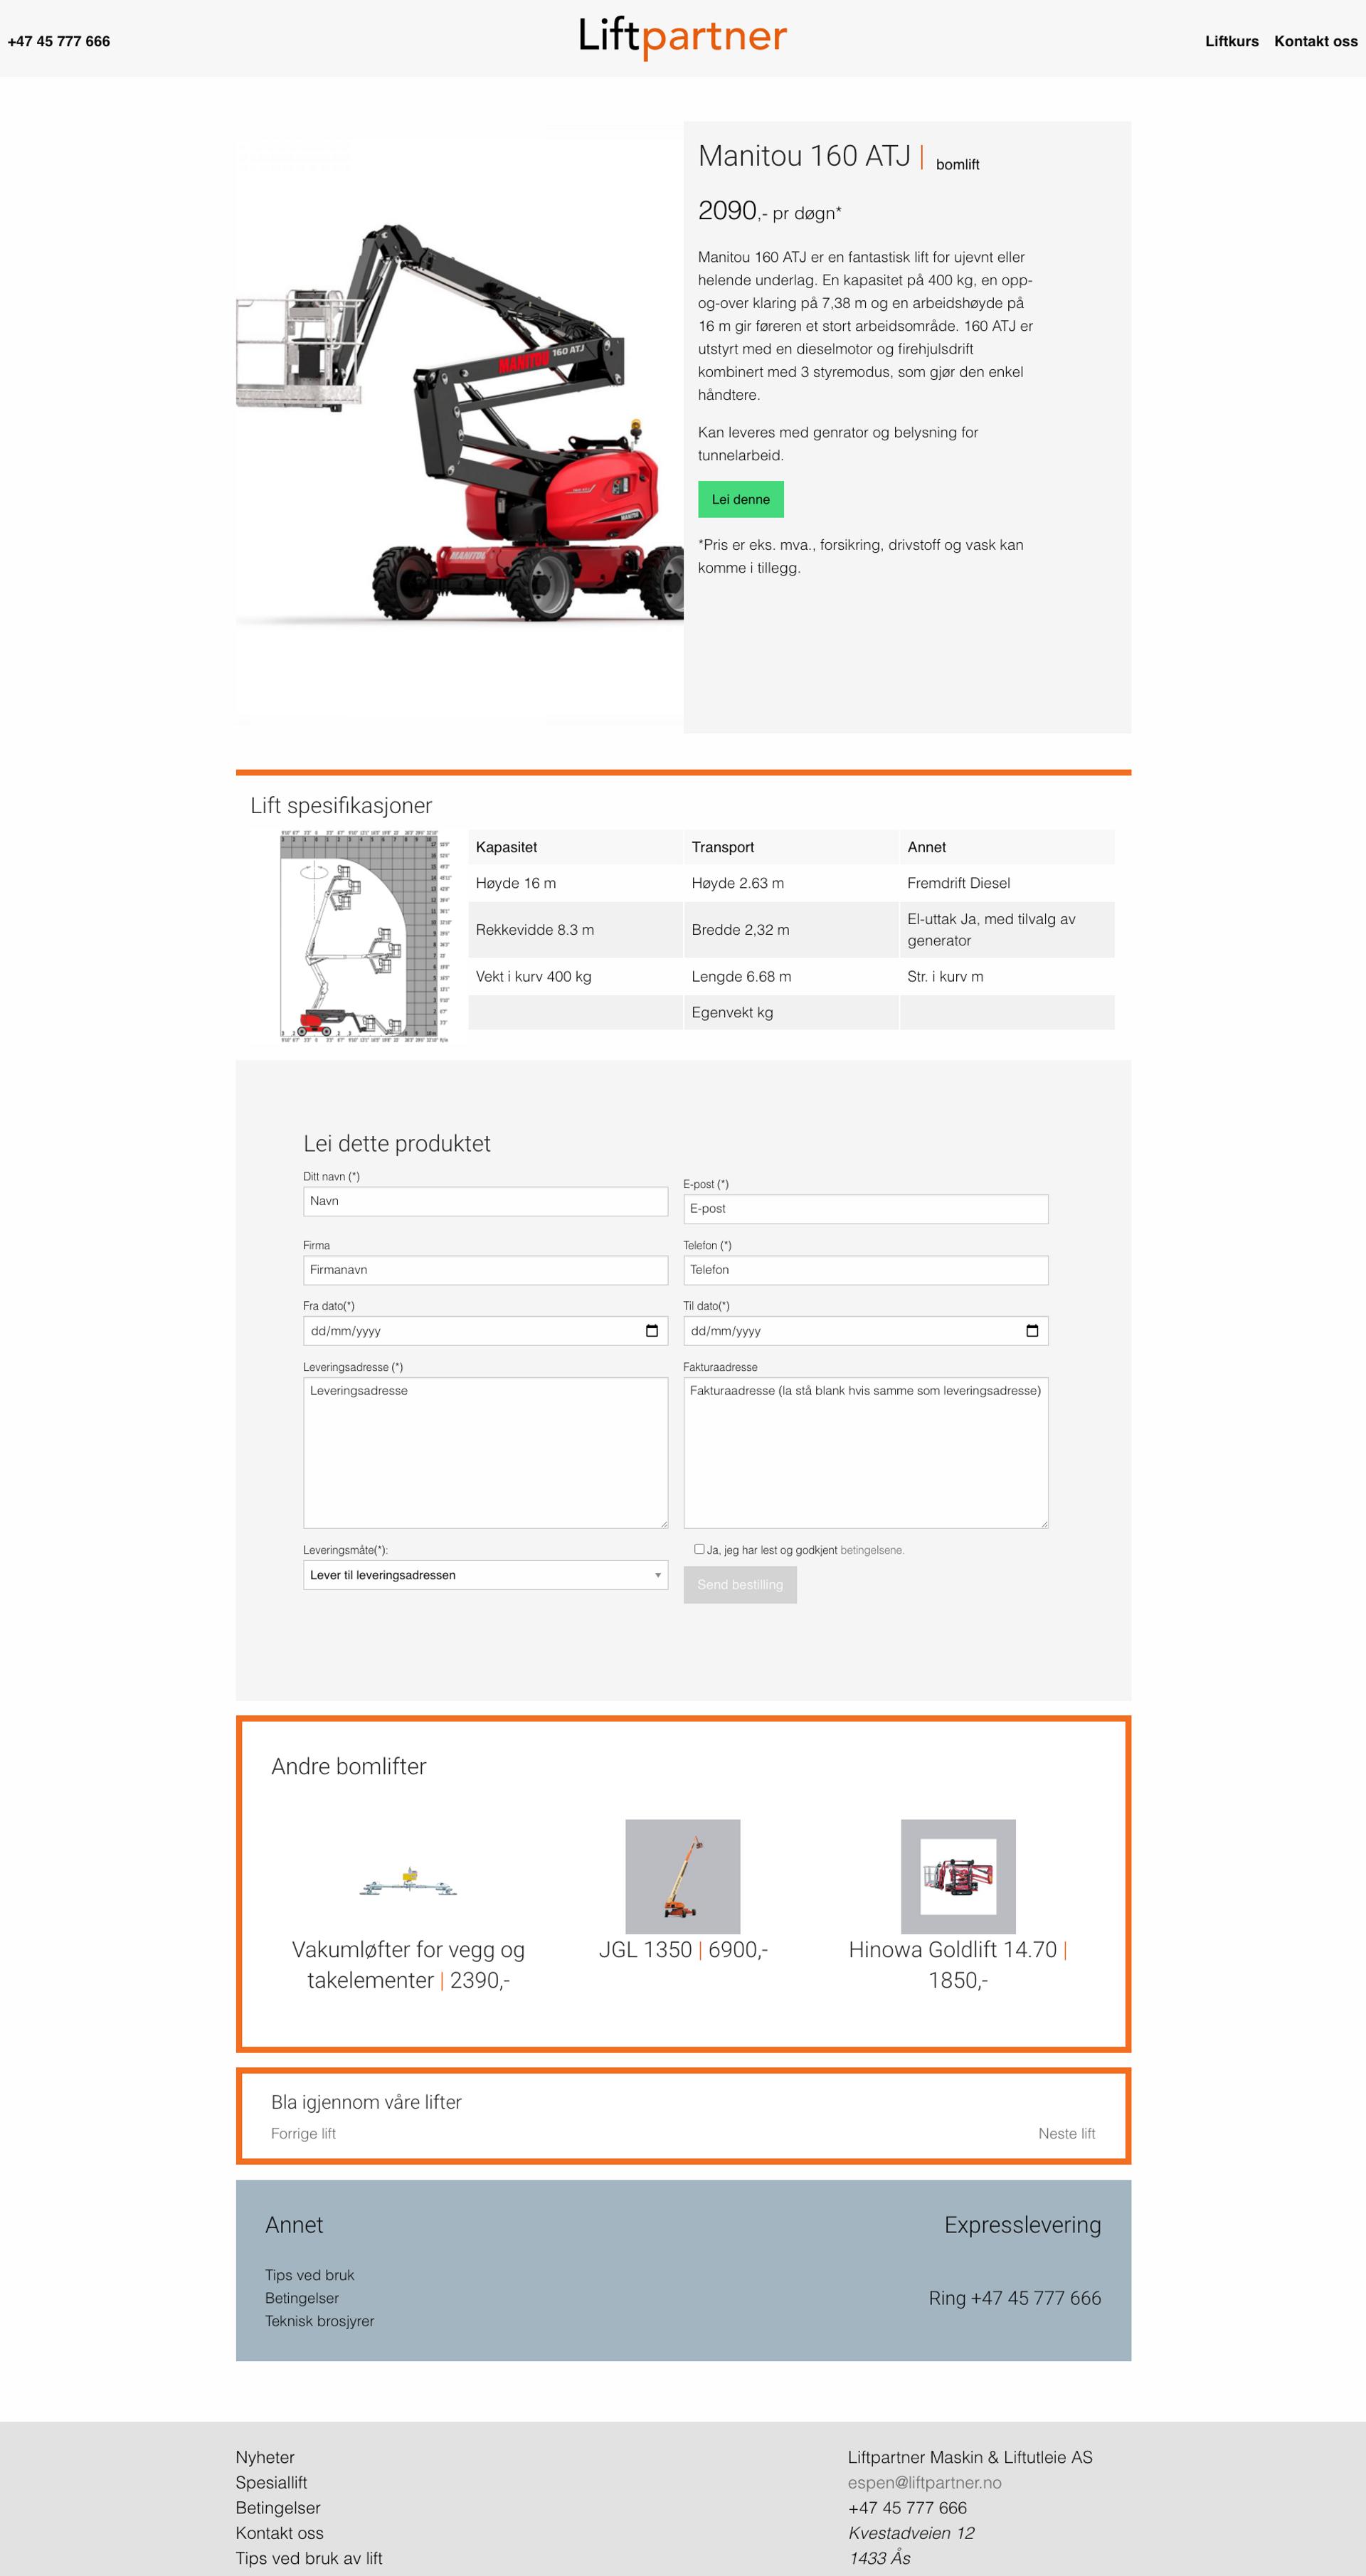 Screenshot of Rent a liftpage